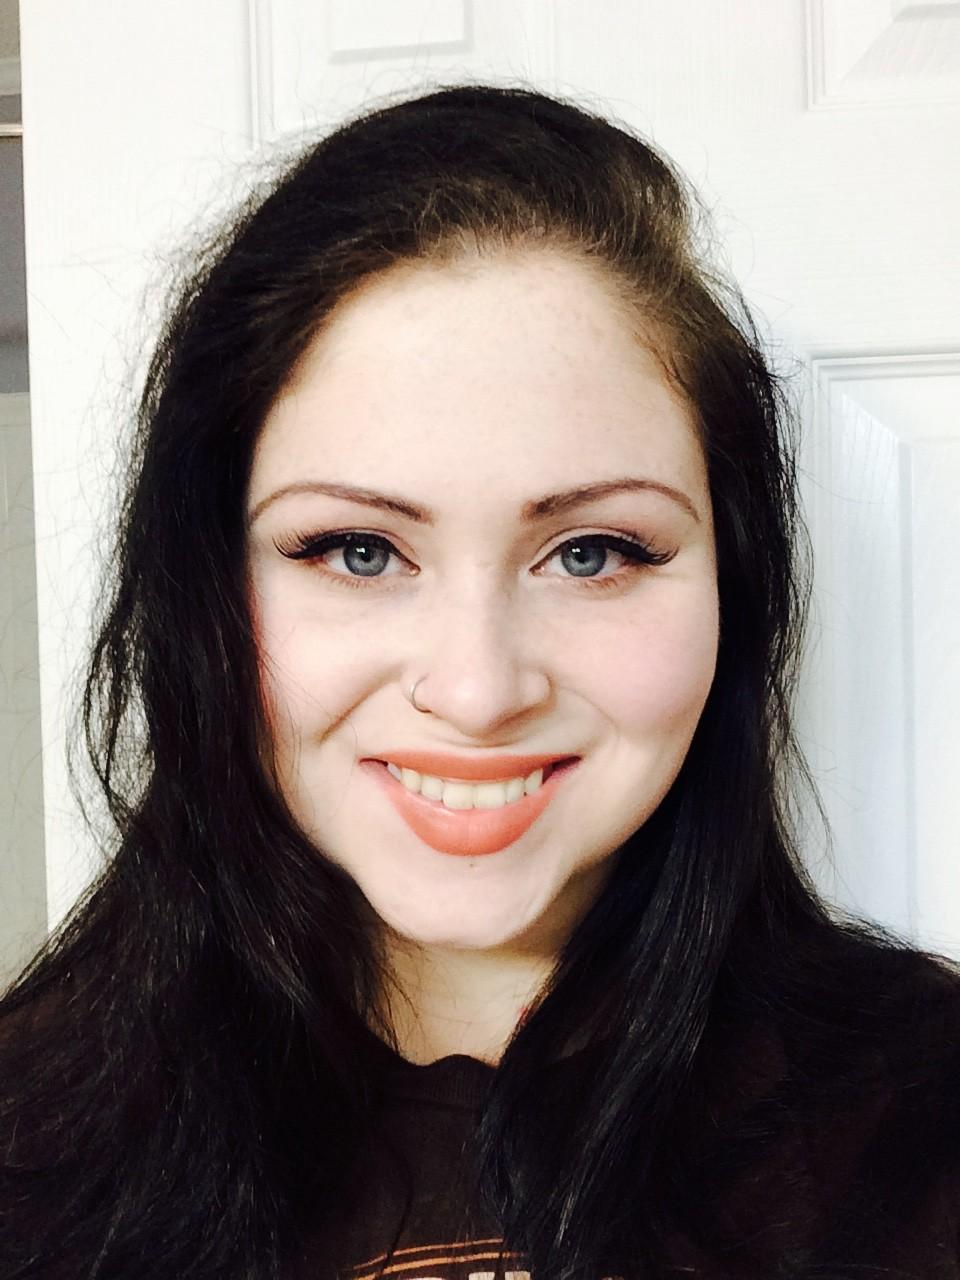 Personal Trainer Houston, Texas - Lana Leguia